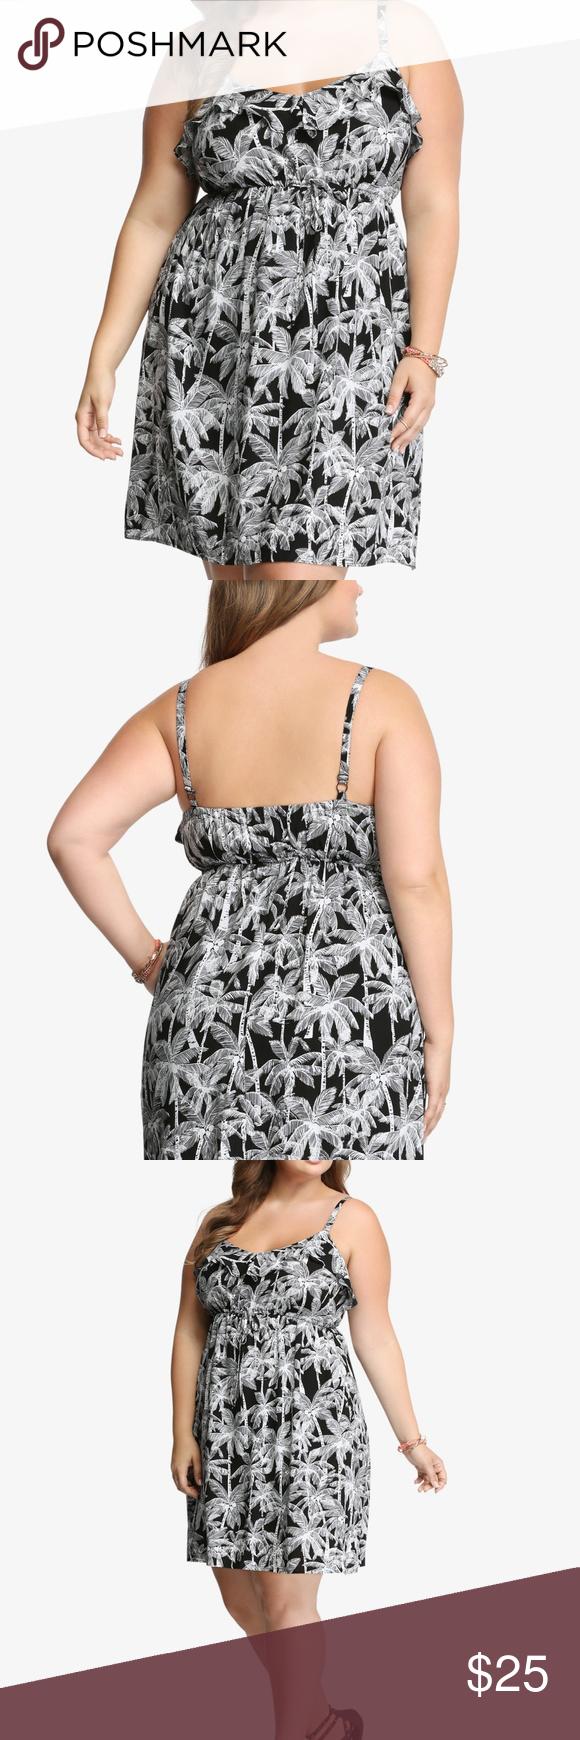 Torrid palm print ruffle dress size torrid womens plus size